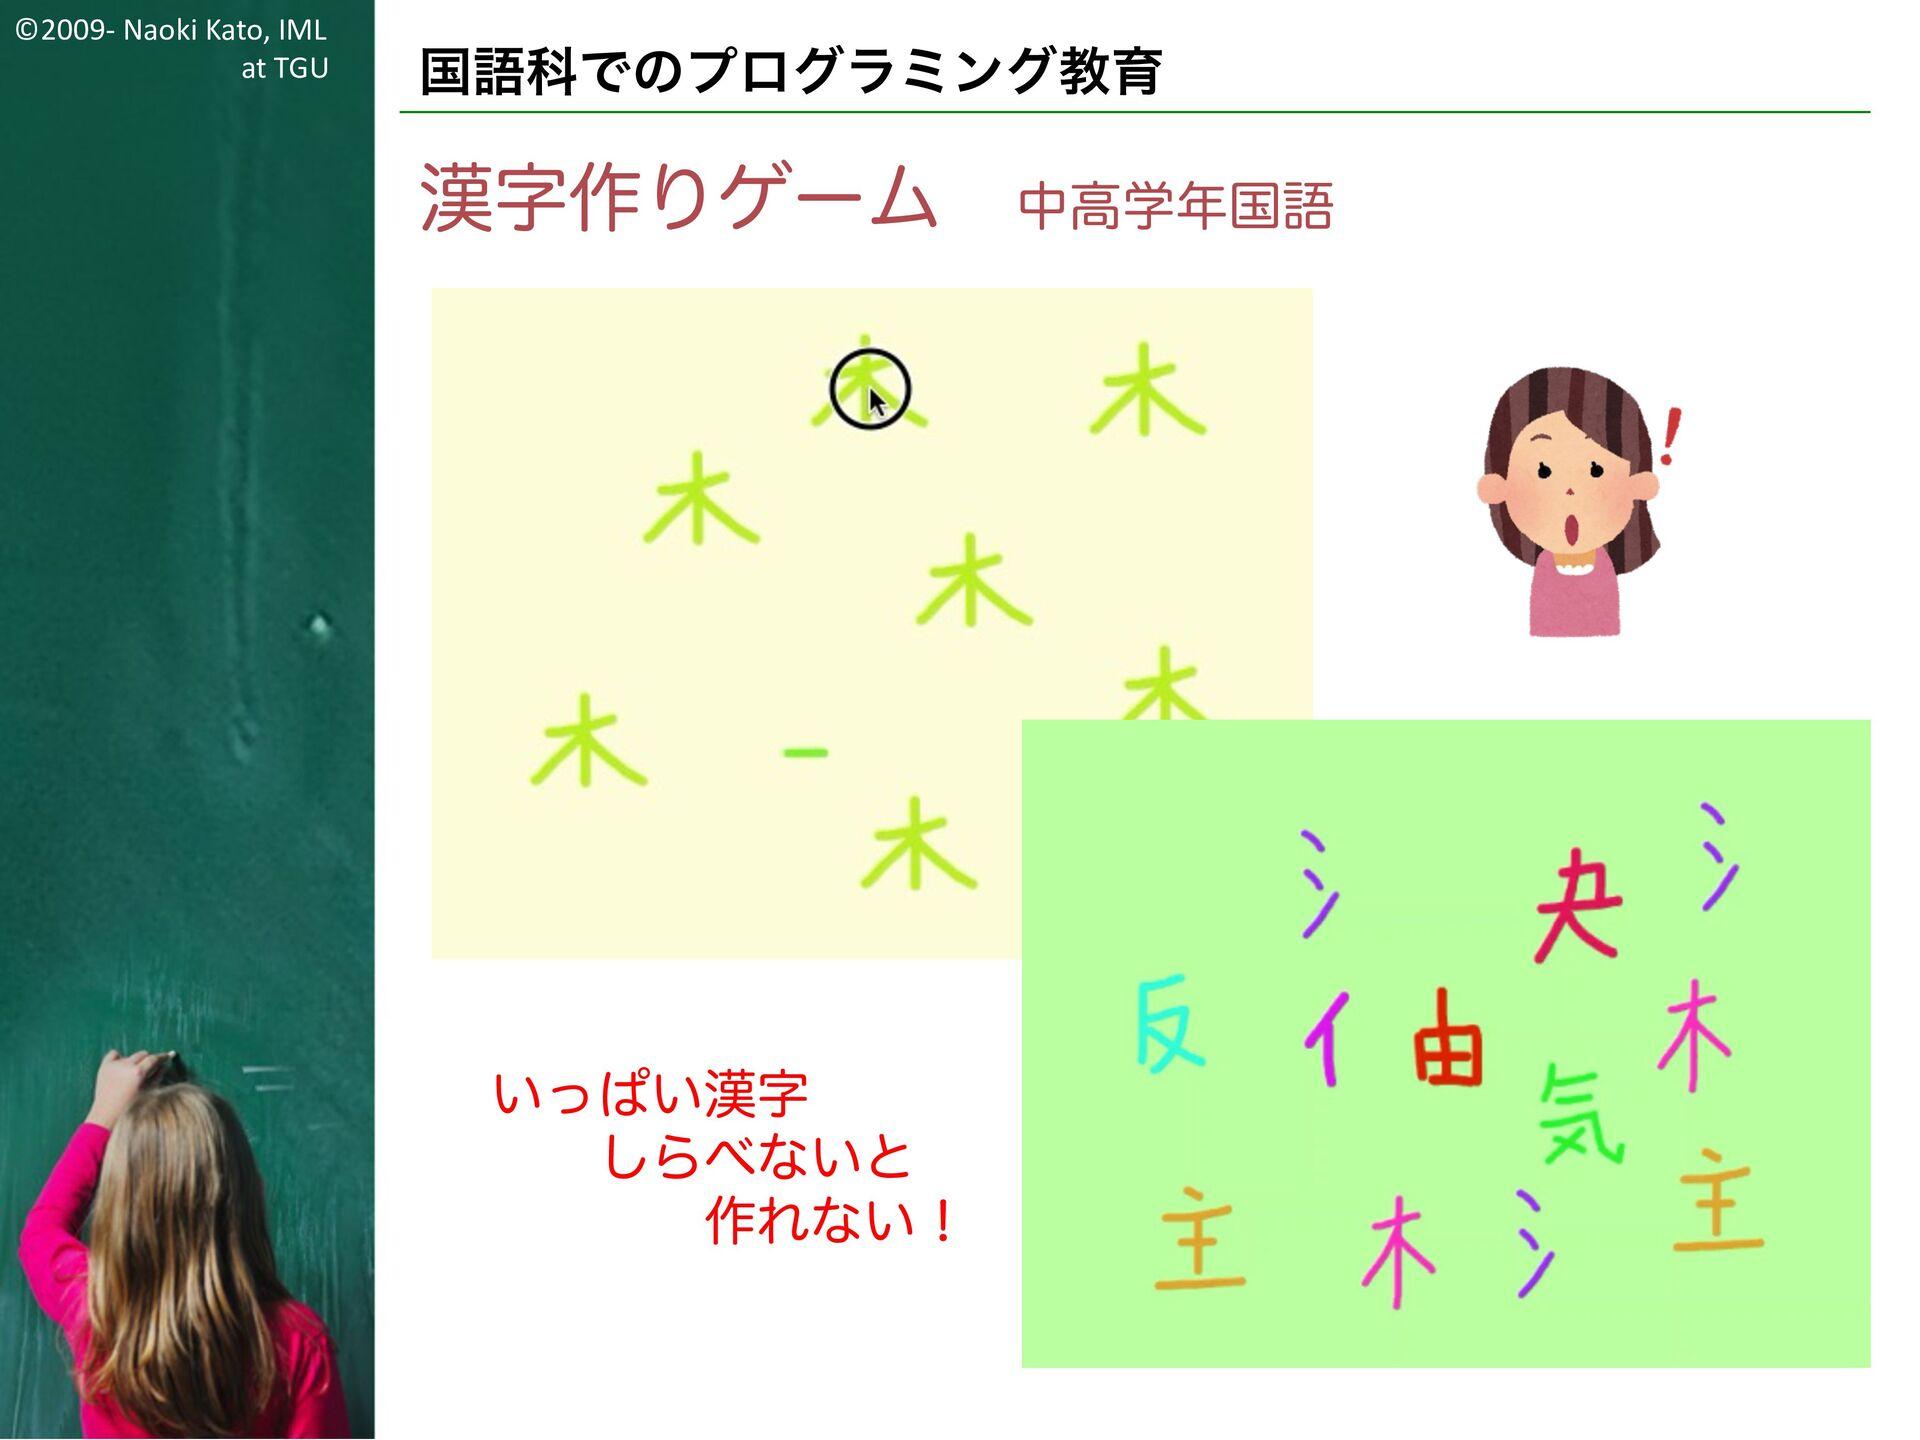 ©2009- Naoki Kato, IML at TGU おしまい 教育の情報化とプログラミ...